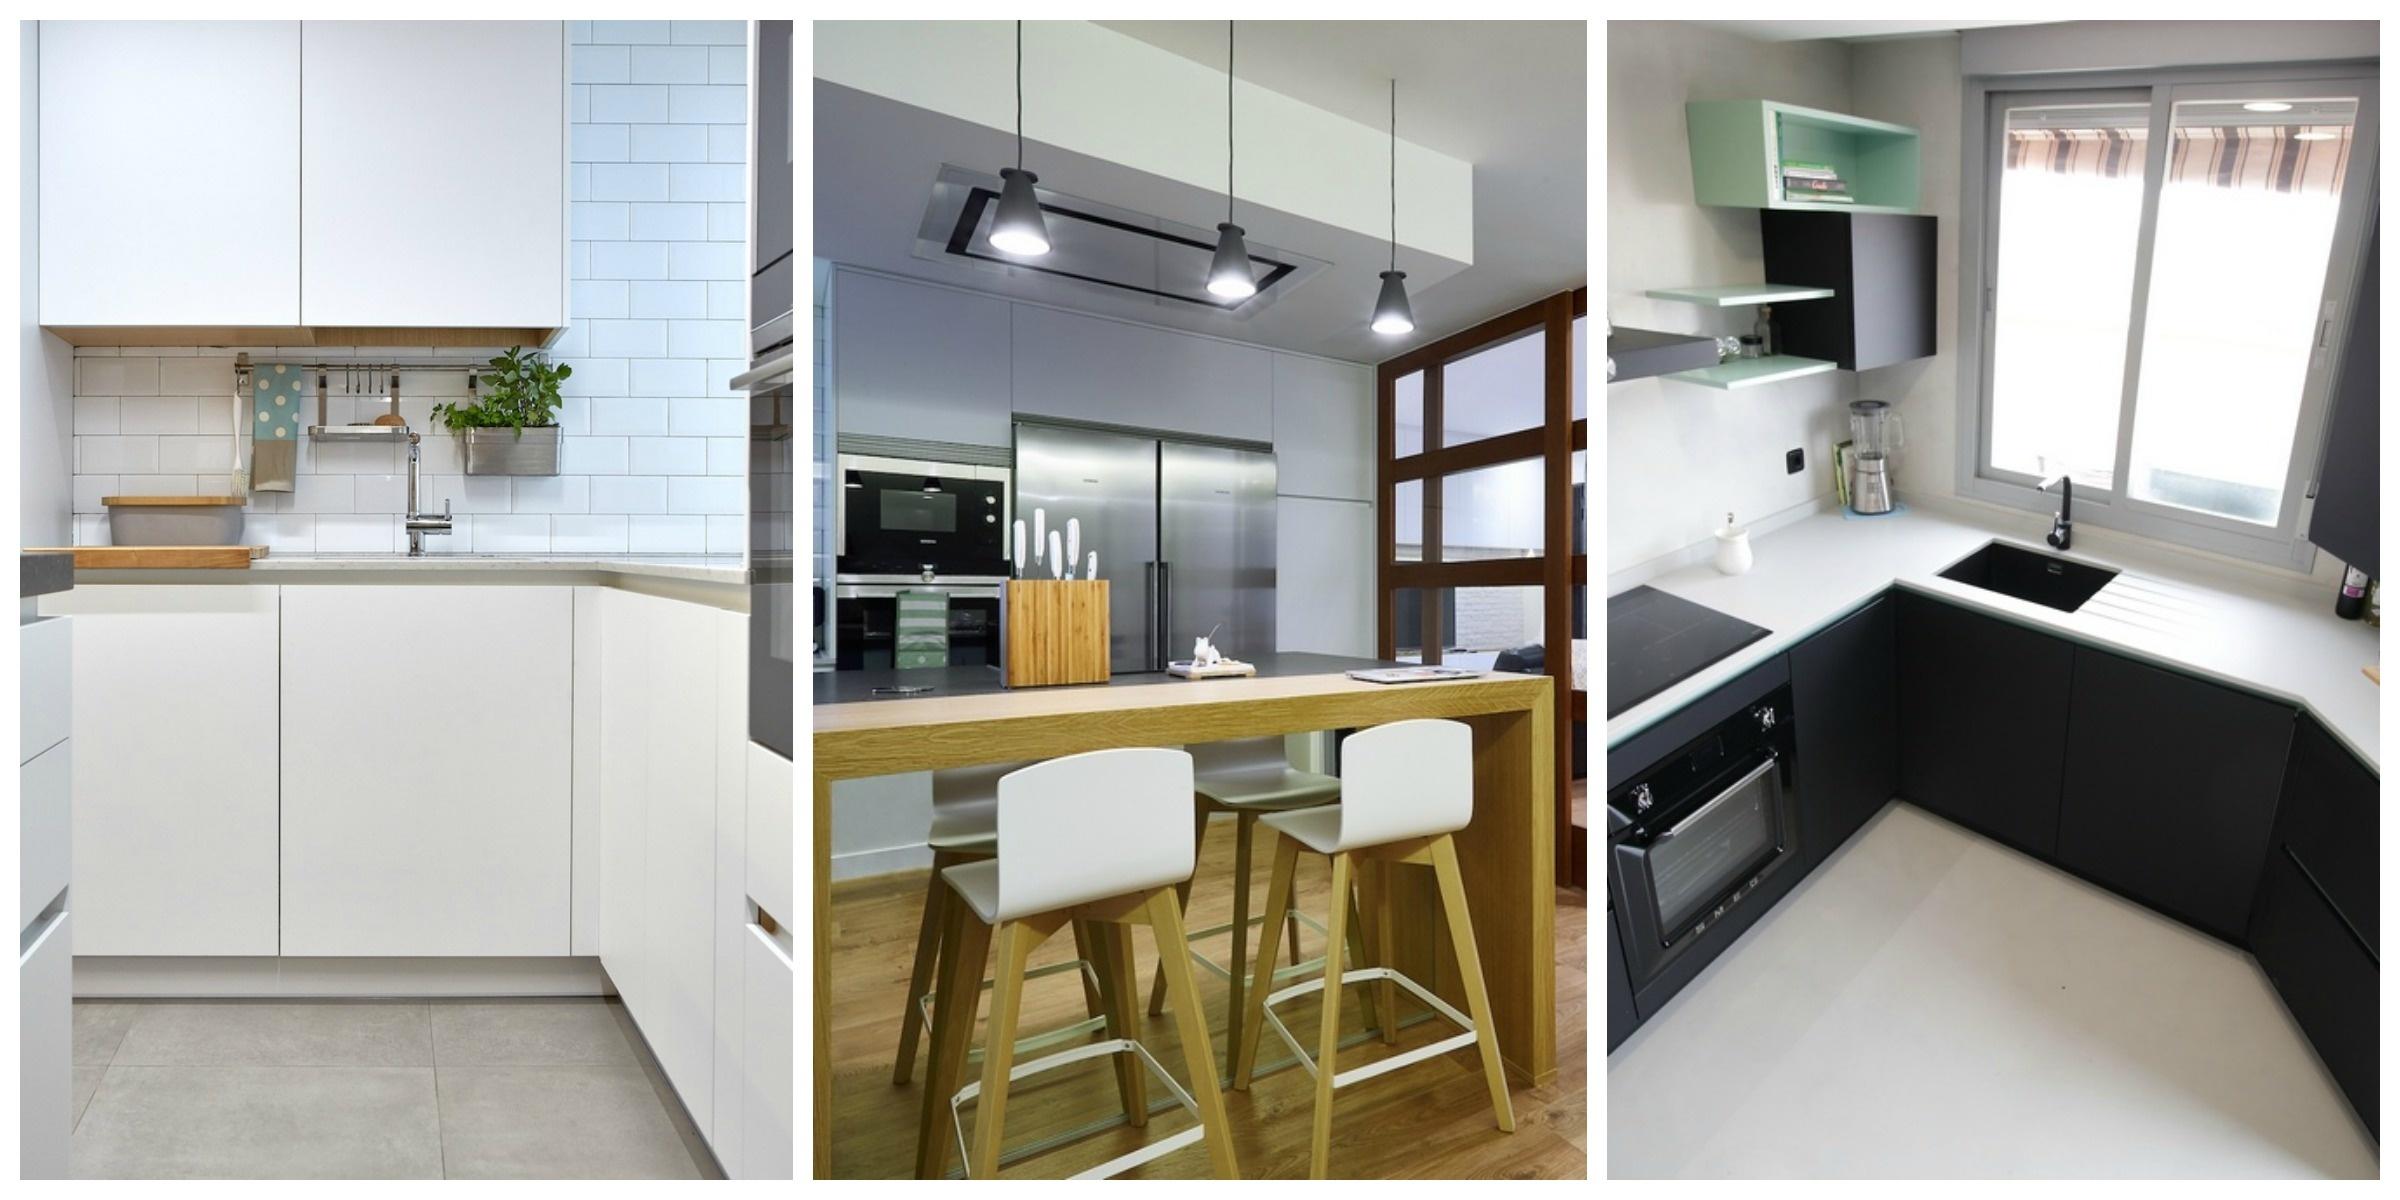 MODAS IMPORTANTES- Blogs de Línea 3 Cocinas, Diseño de cocinas ...